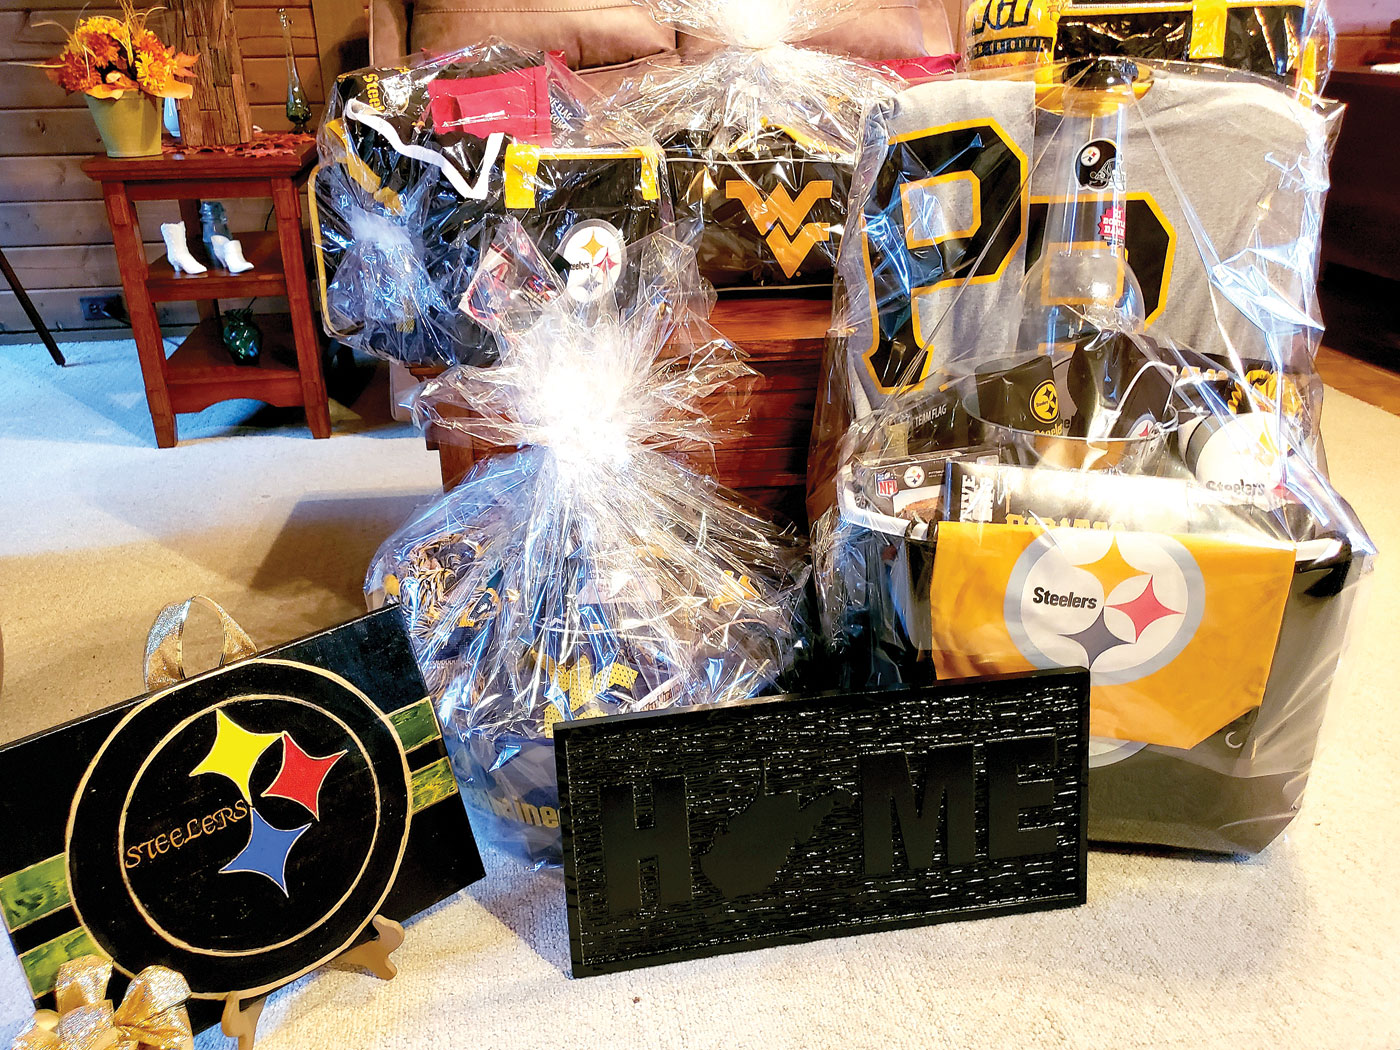 Steelers Baby Gift Basket Gift Ftempo & Pittsburgh Steelers Gift Baskets - Ofertasvuelo